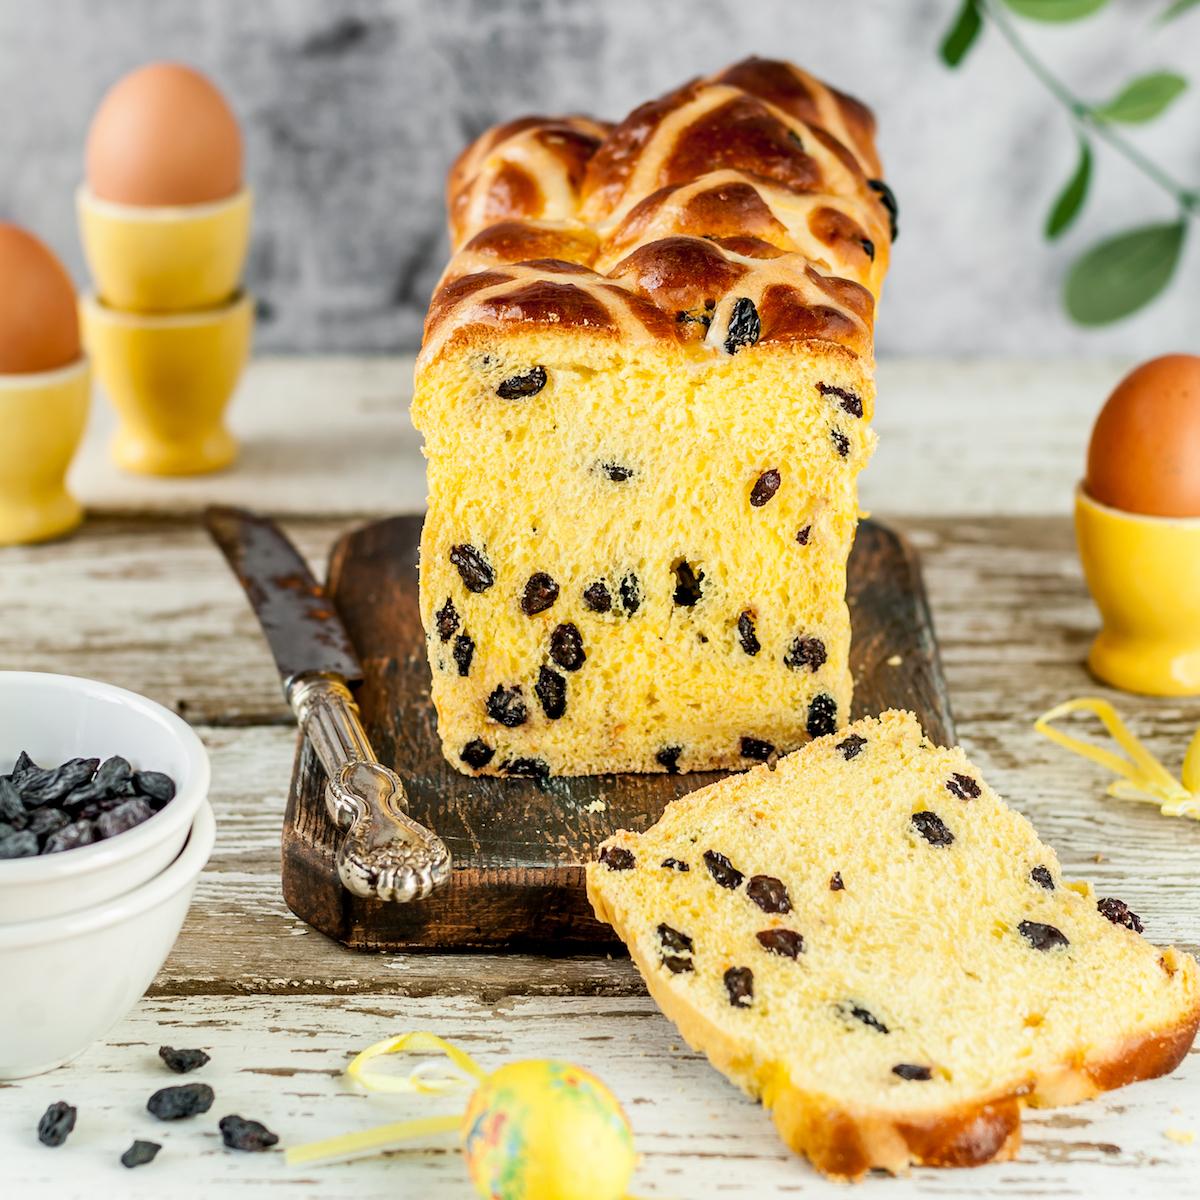 Cornish saffron cake ©De Tatiana Vorona shutterstock